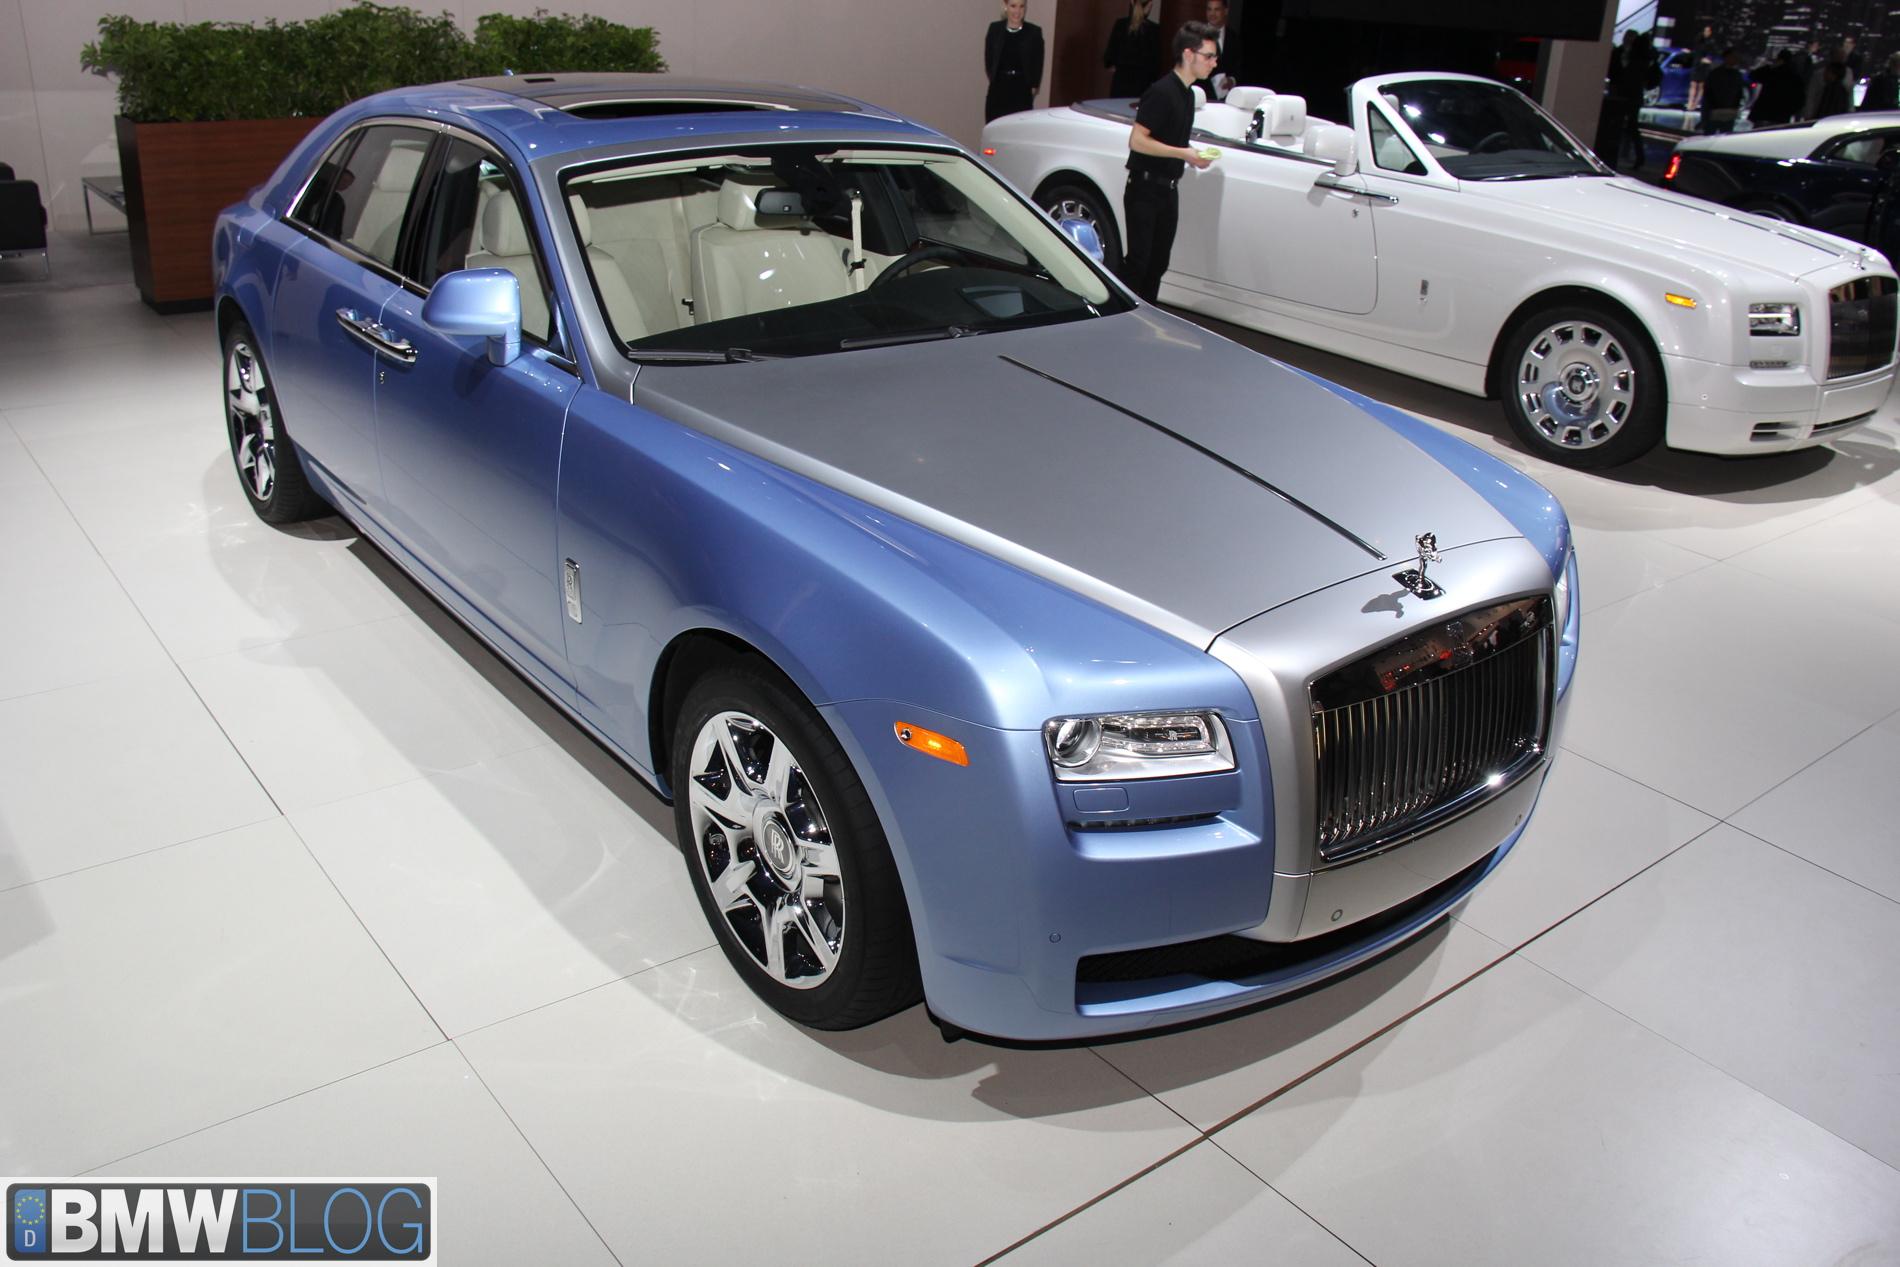 Rolls Royce 2013 New York Auto Show 02